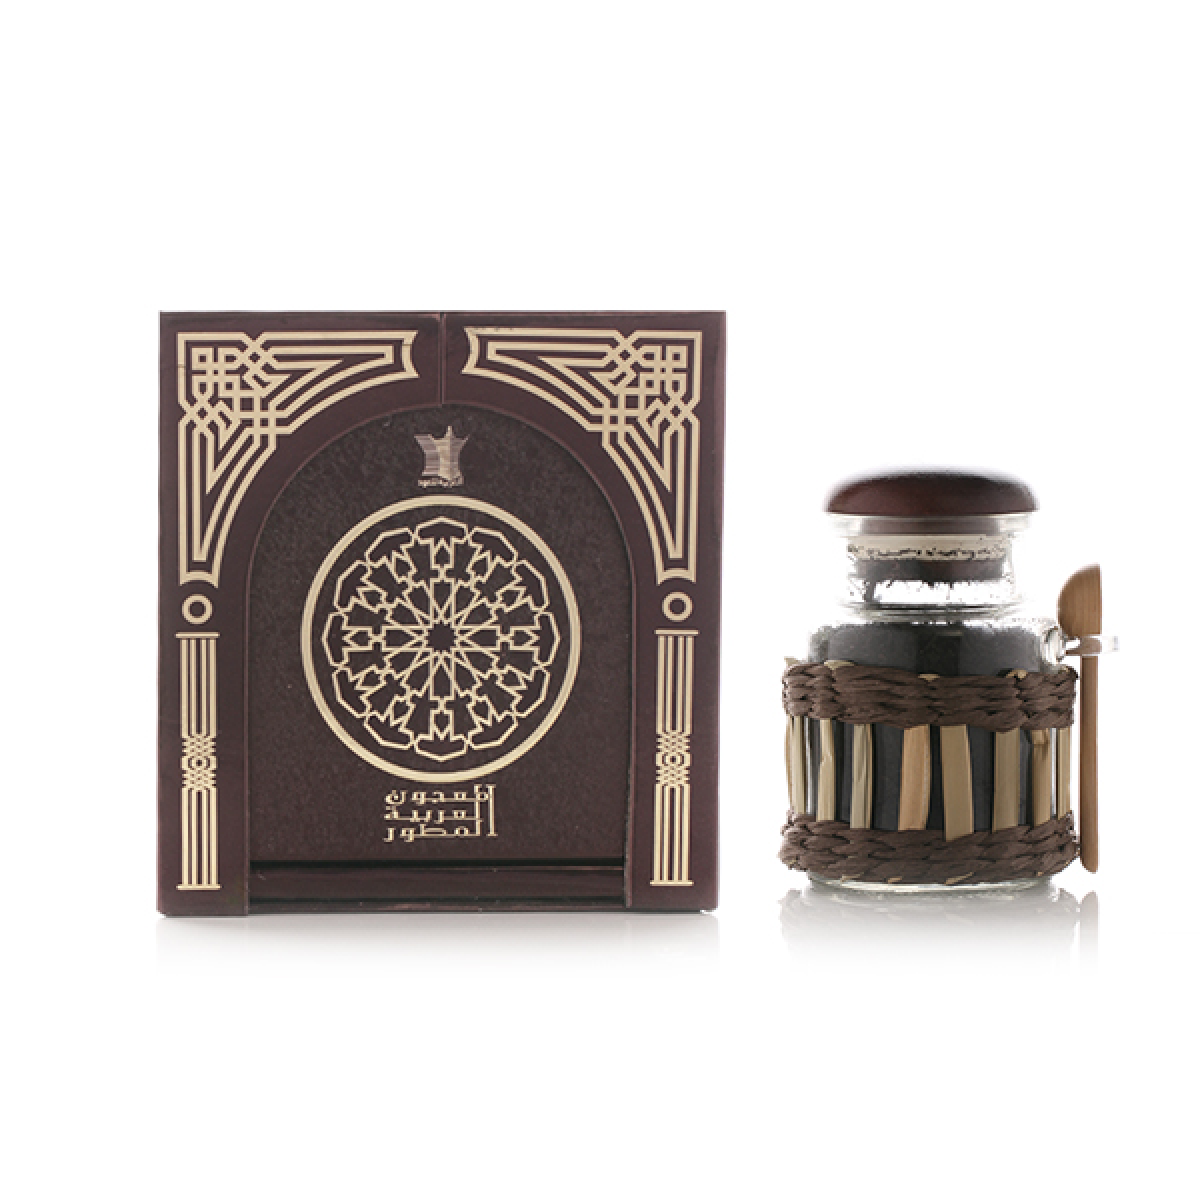 Maajoun Al Arabia motawar Encens par Arabian Oud 80 g-livraison gratuite madjoun